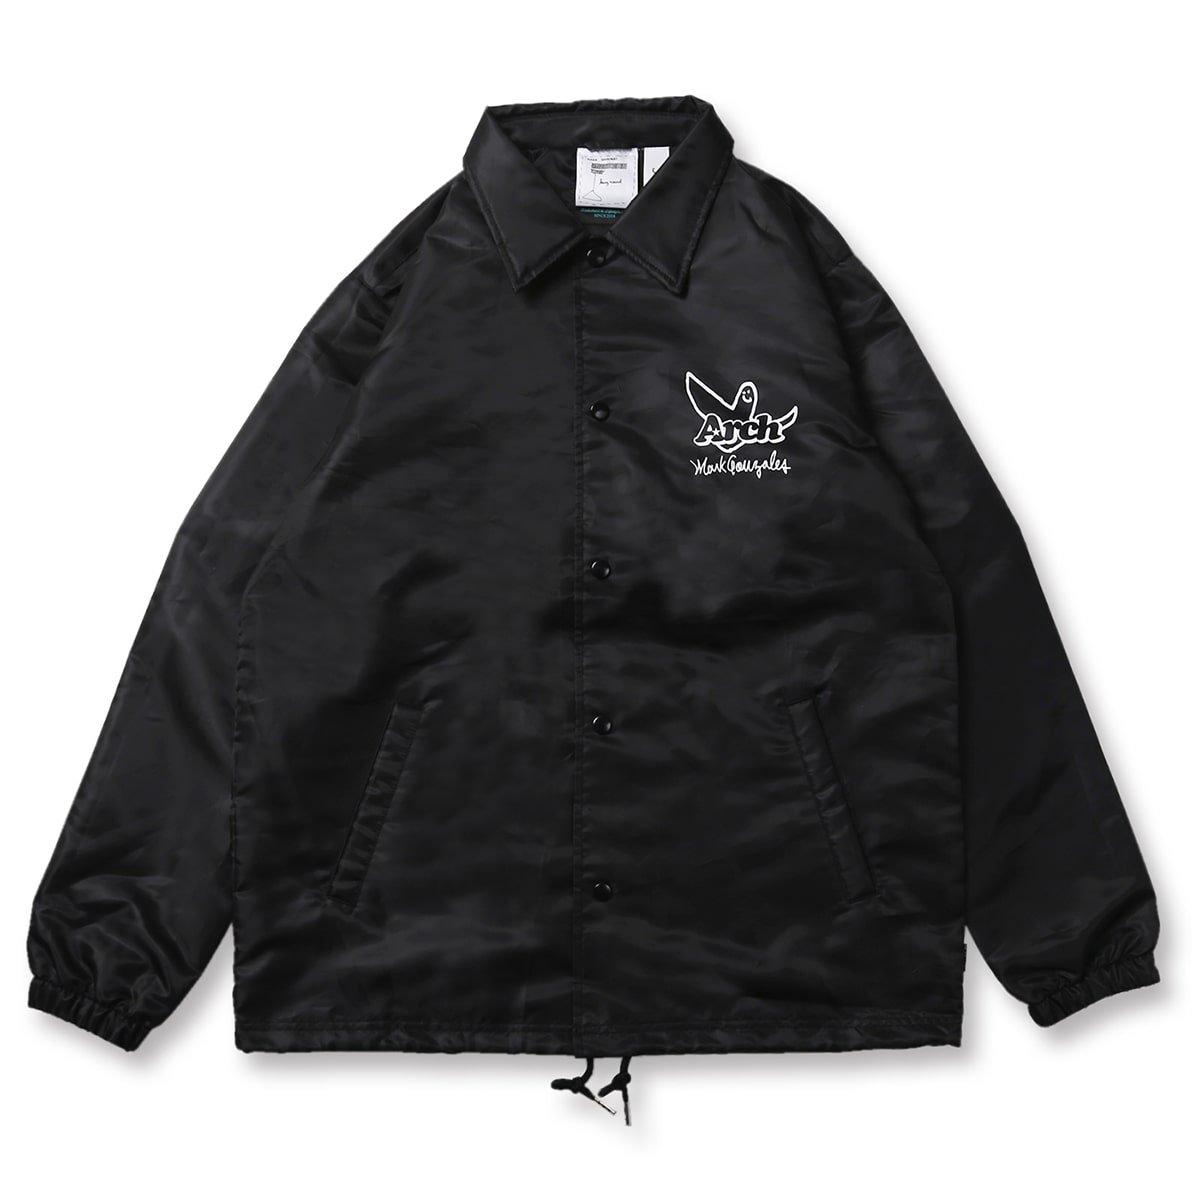 Mark Gonzales x Arch ball MG coach jacket【black】